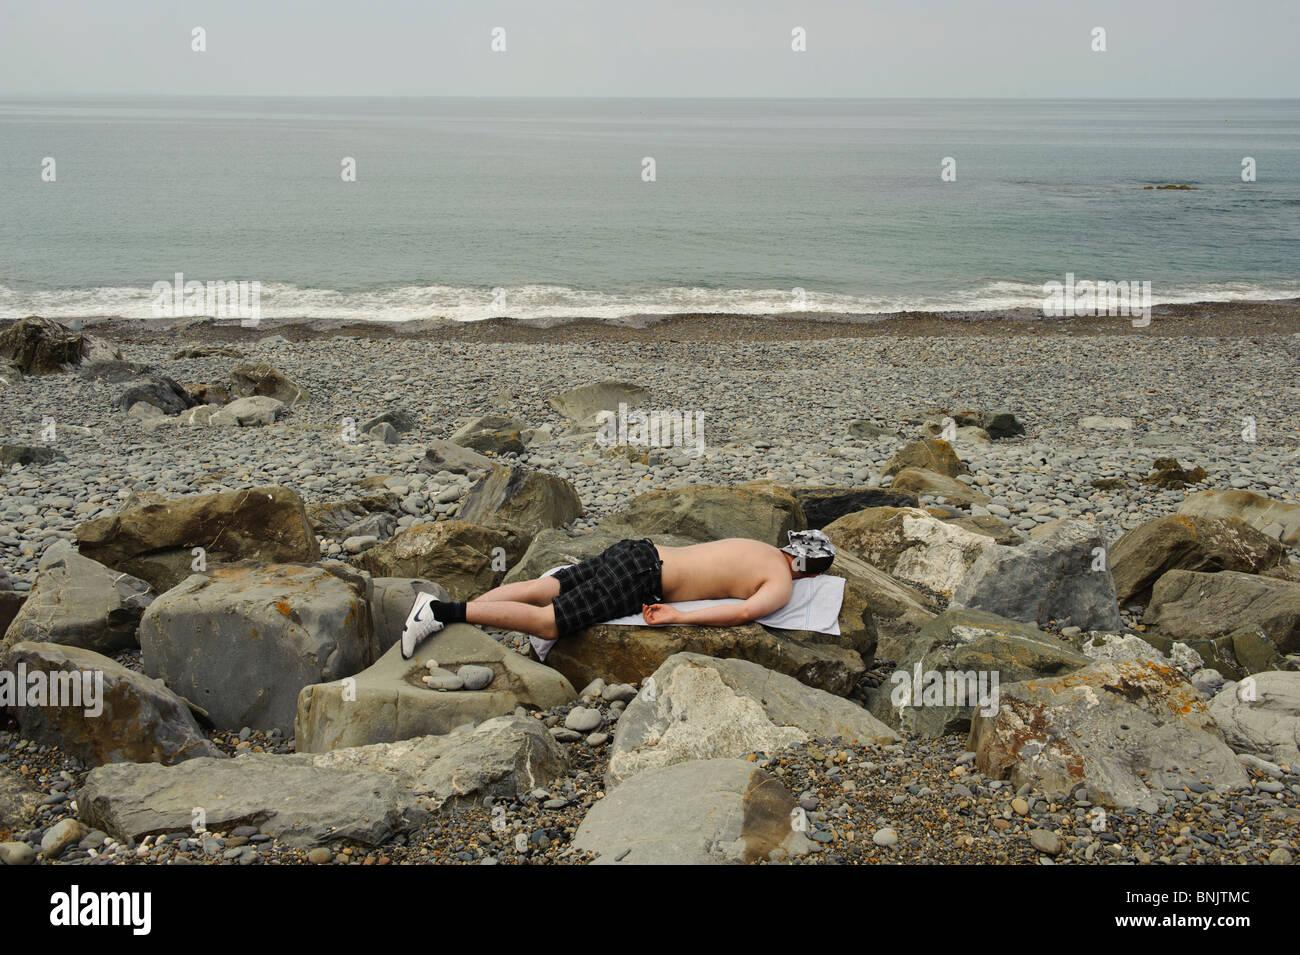 A man sunbathing on the beach lying face down on rocks , Aberystwyth Wales UK - Stock Image